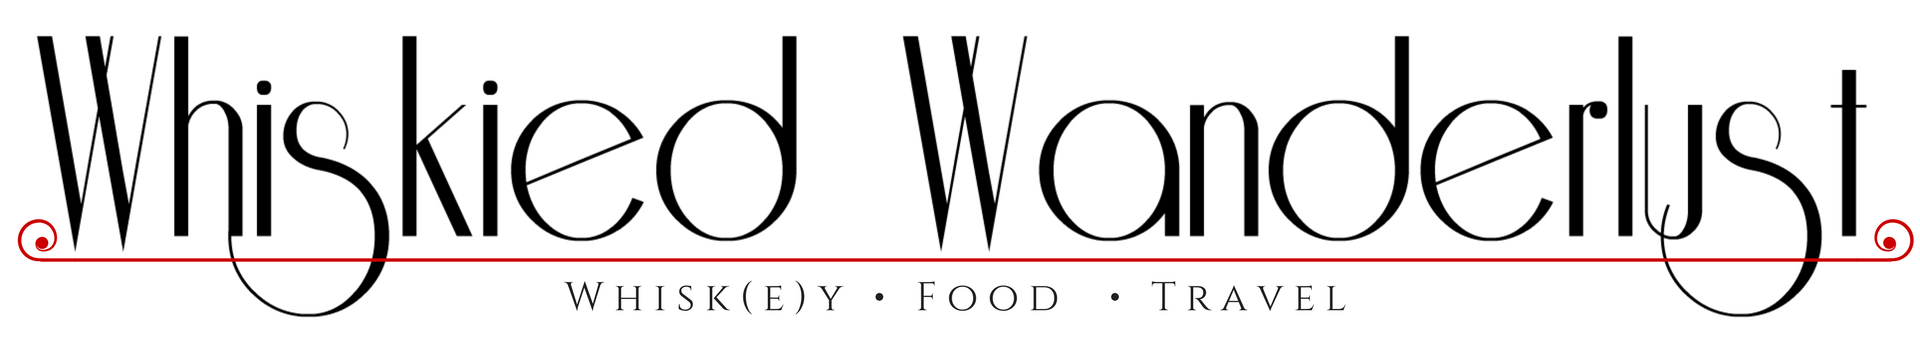 Whiskied Wanderlust - Whisk(e)y • Food • Travel